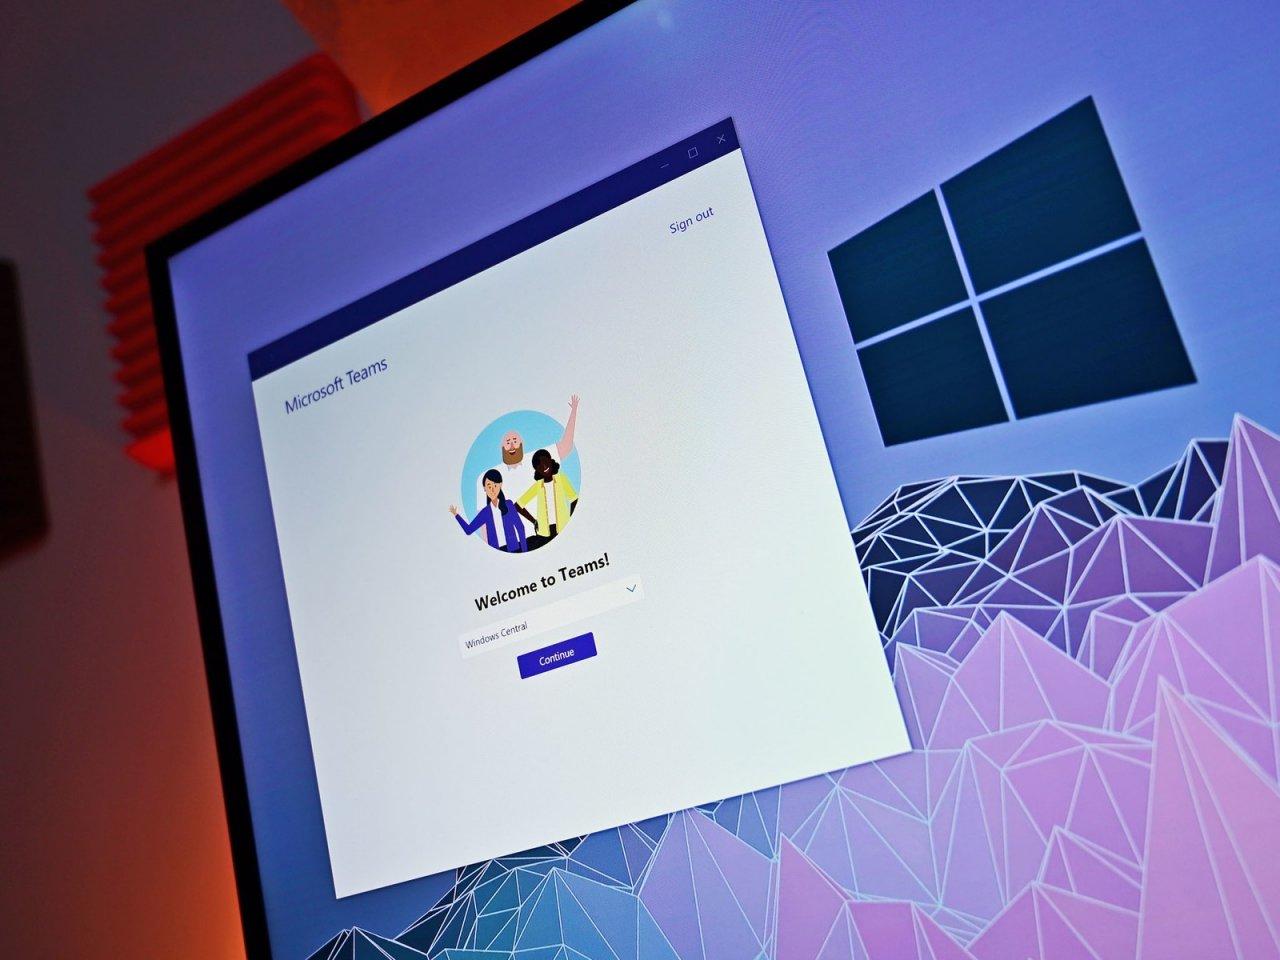 В программе тестирования Microsoft Teams появился канал Public Preview